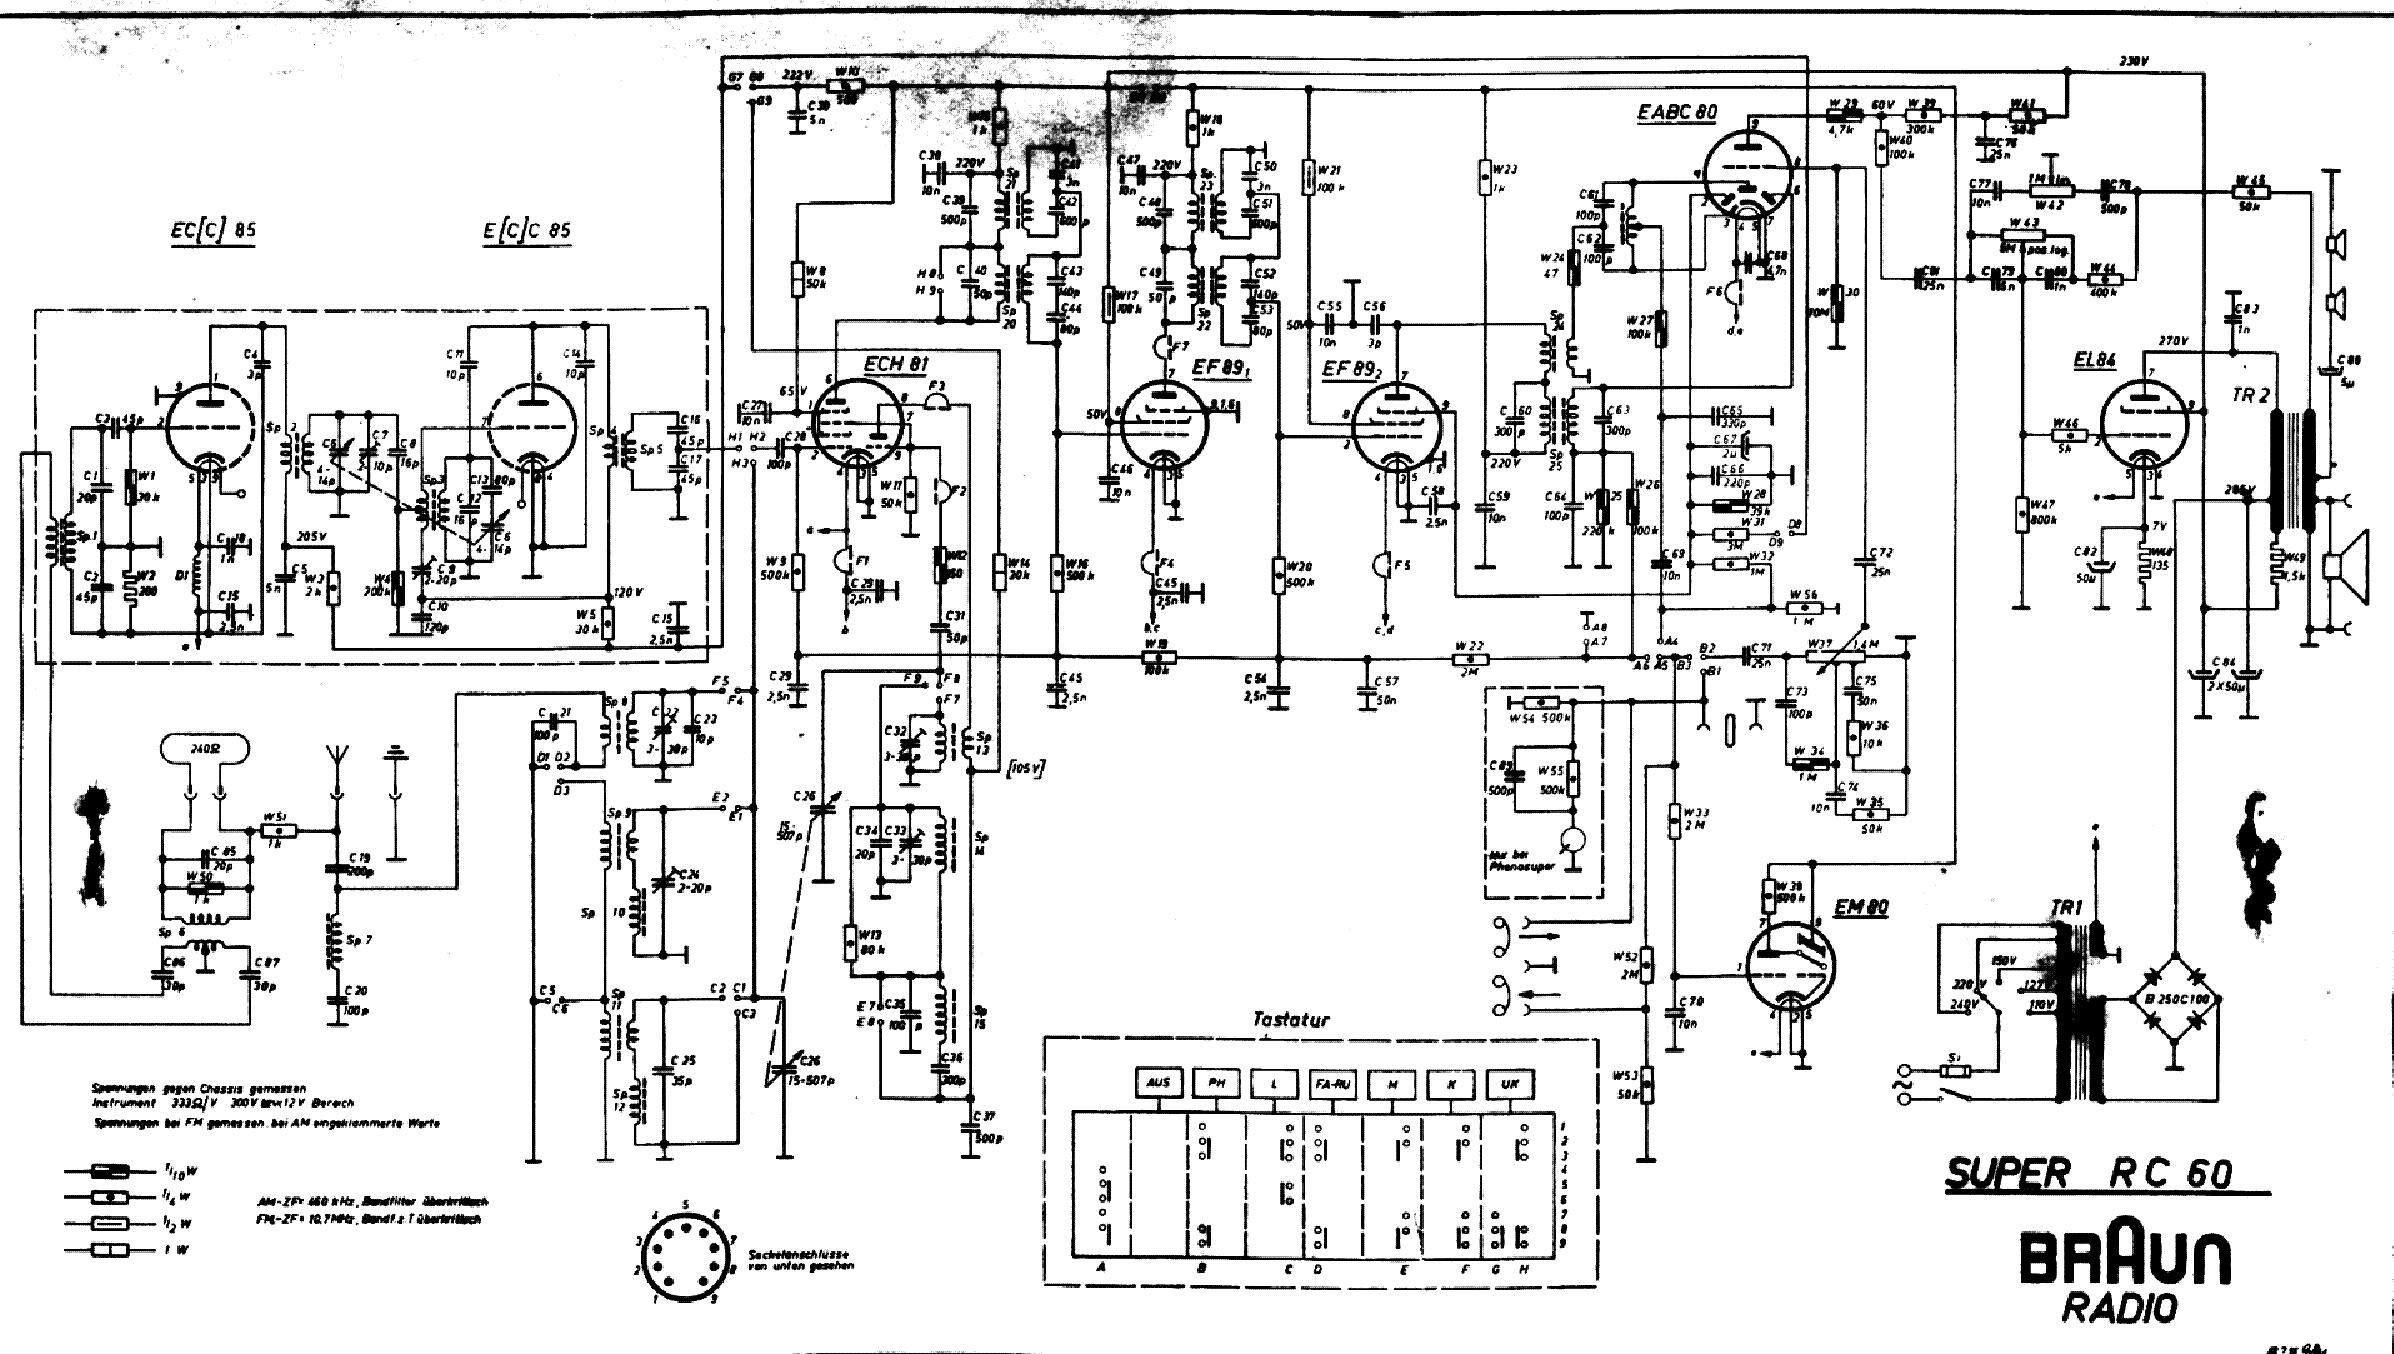 rc60 wiring diagram 1 wiring diagram sourcerc60 wiring diagram schematic diagramrc60 wiring diagram manual e books caterpillar rc60 rc60 wiring diagram all